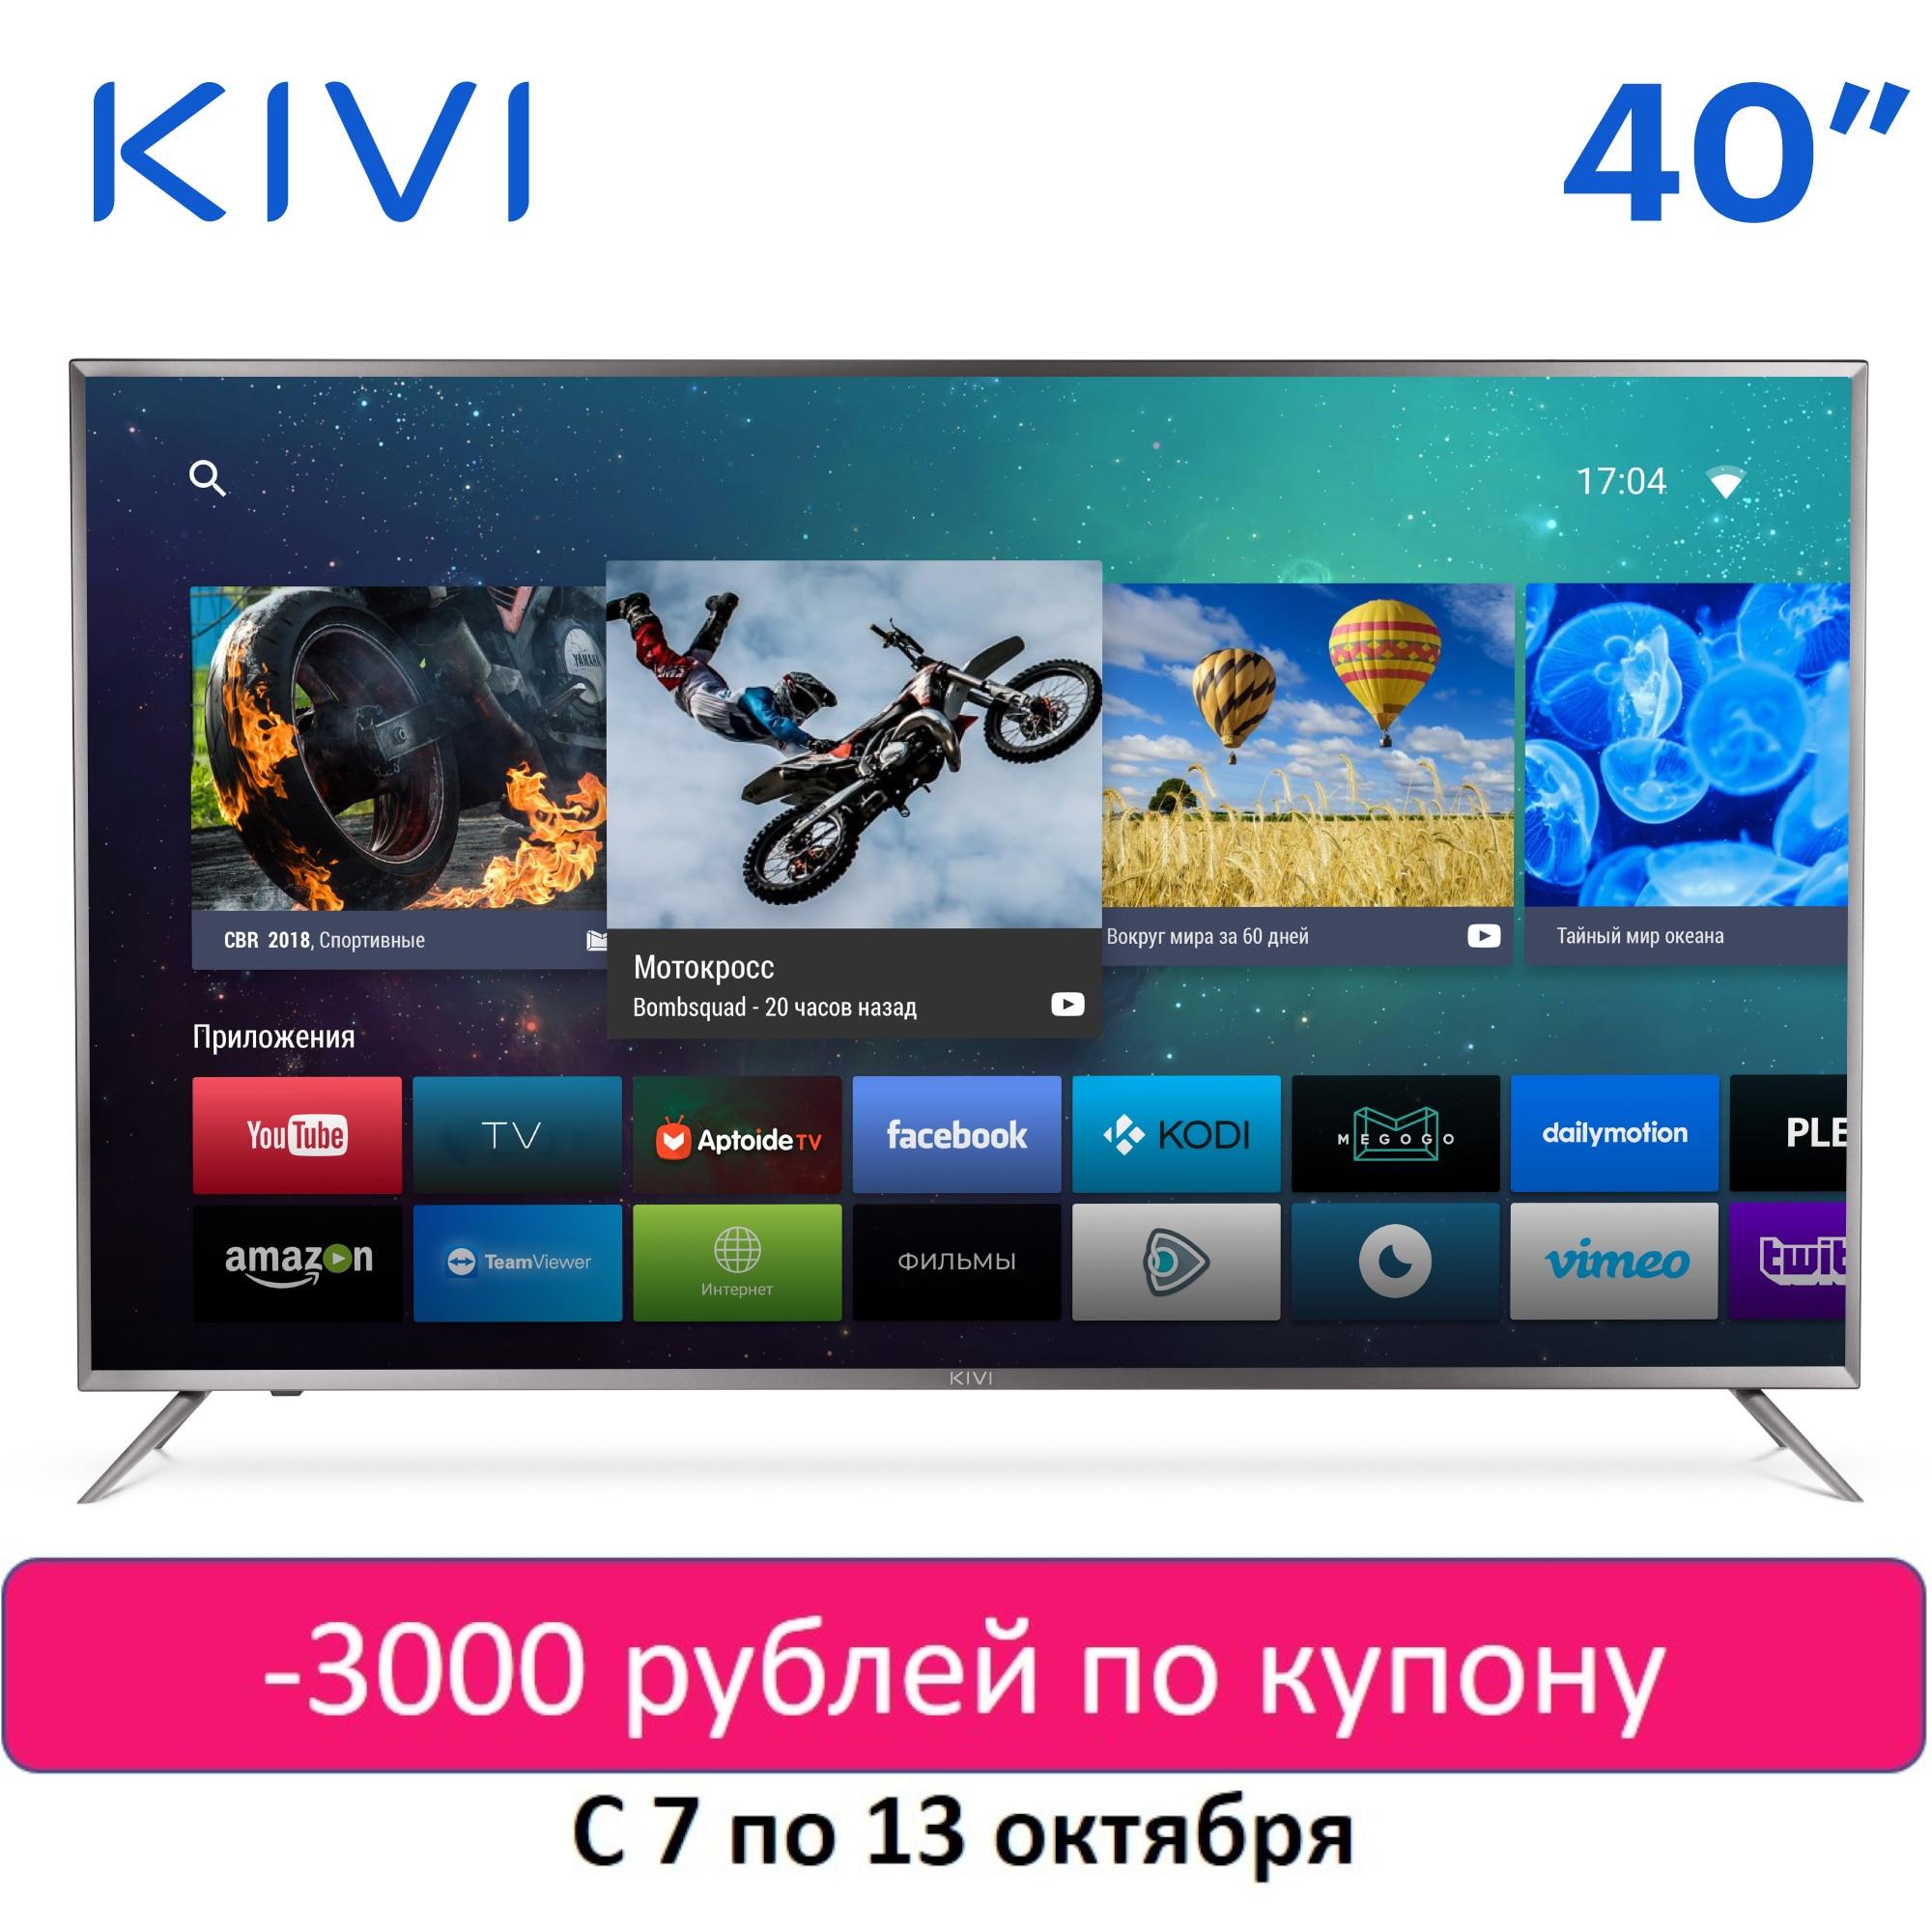 LED Television KIVI 40UR50GR UHD 4k Smart TV Android HDR digital dvb dvb-t dvb-t2 40inchTv